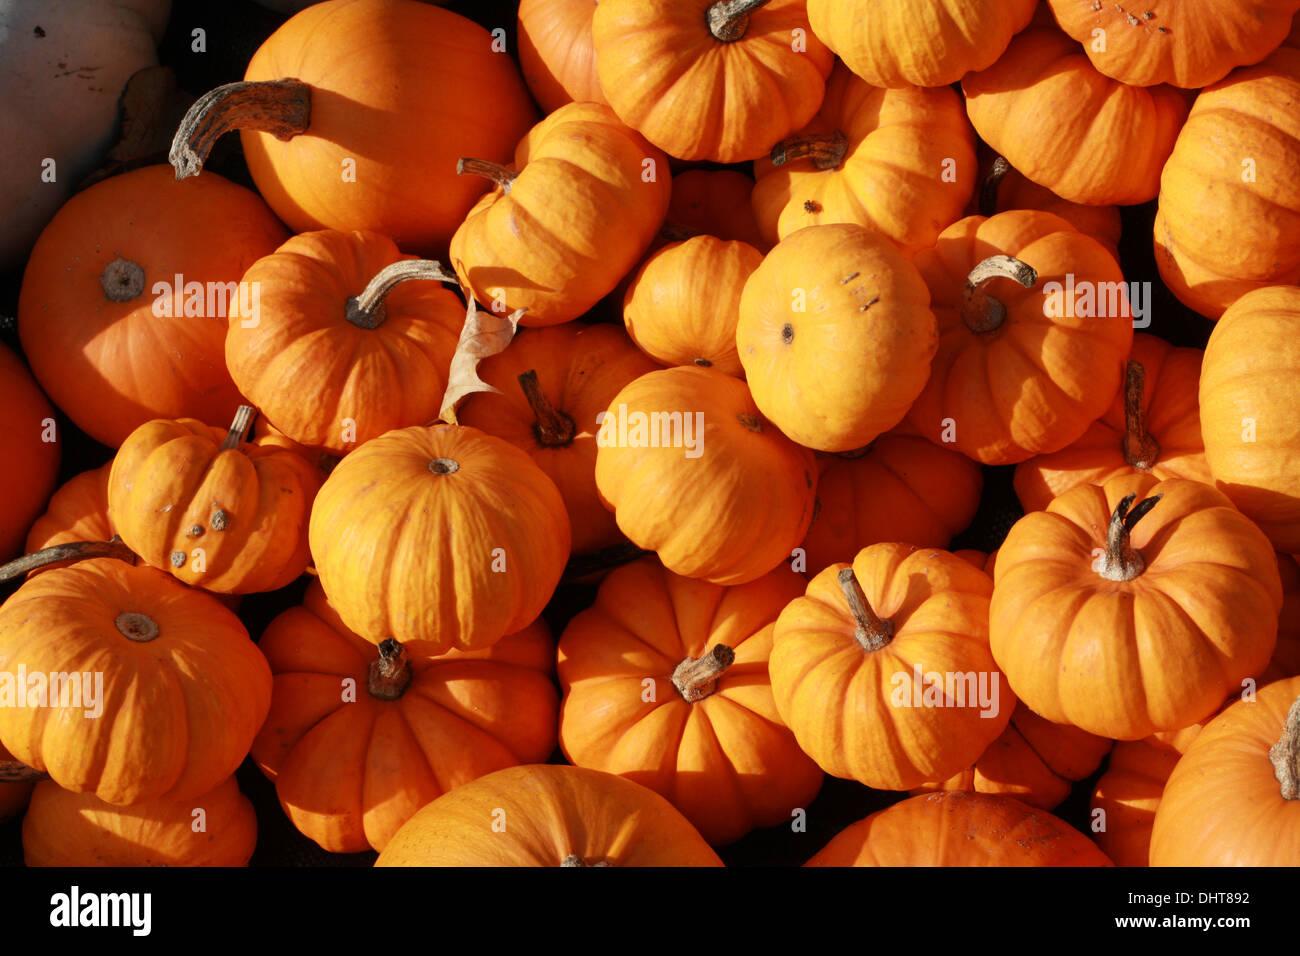 Pumpkins 'Munchkin', Cucurbita pepo, Cucurbitaceae. Aka Squash, Winter Squash, Summer Squash. - Stock Image